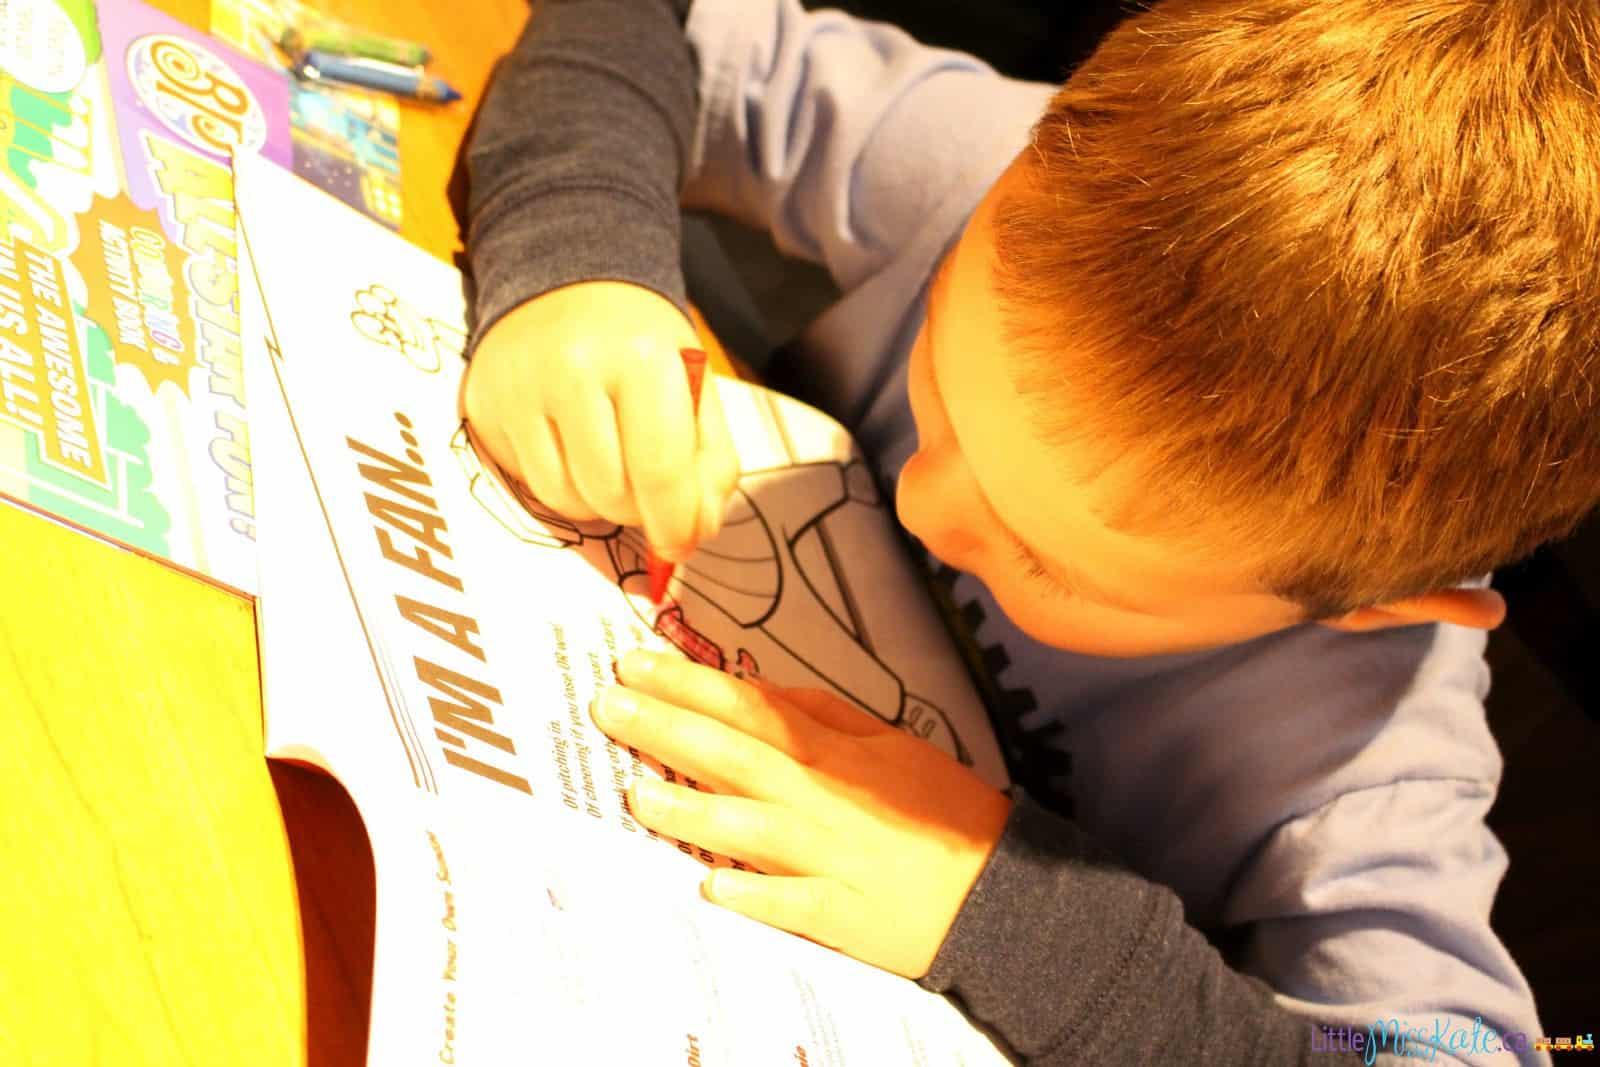 americana waterpark resort boston pizza niagara falls review kids activities